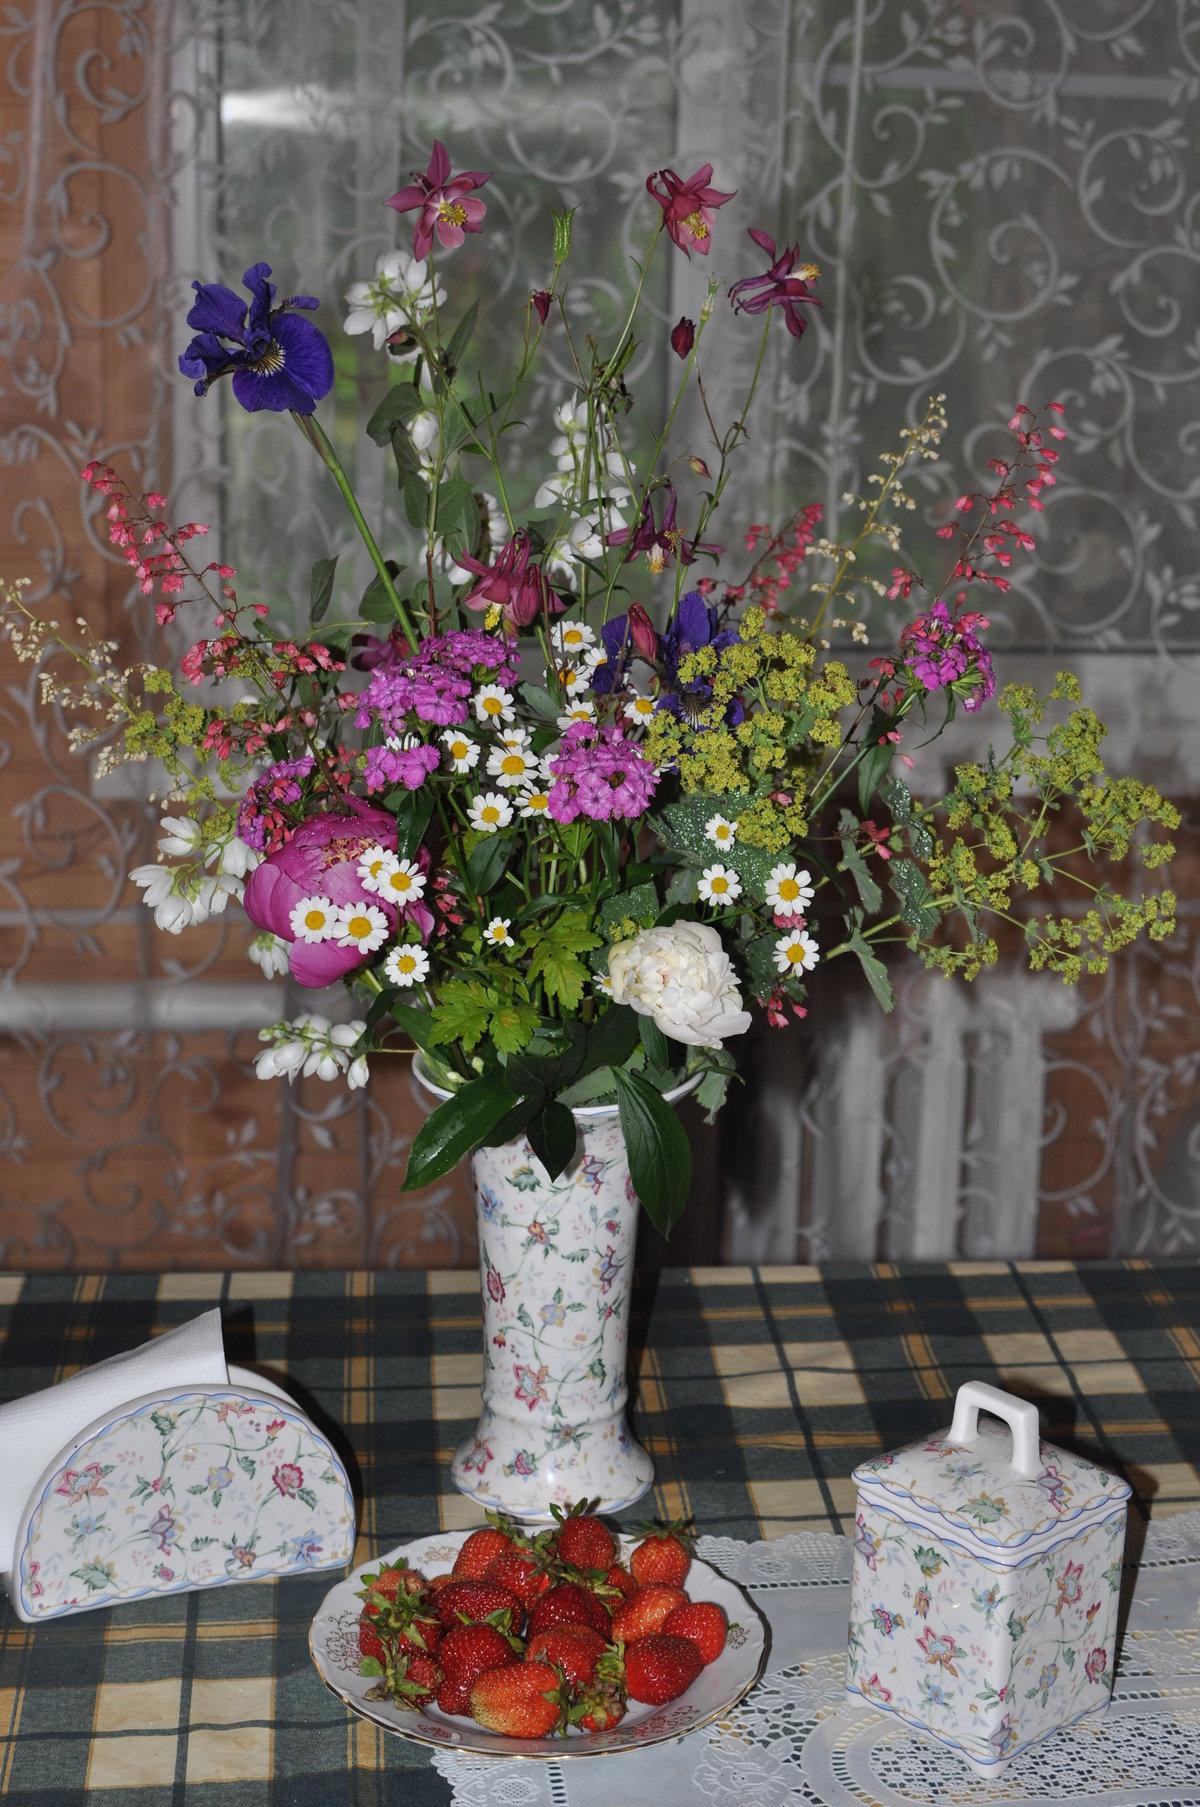 Цветы, красивое название букетов на старый манер